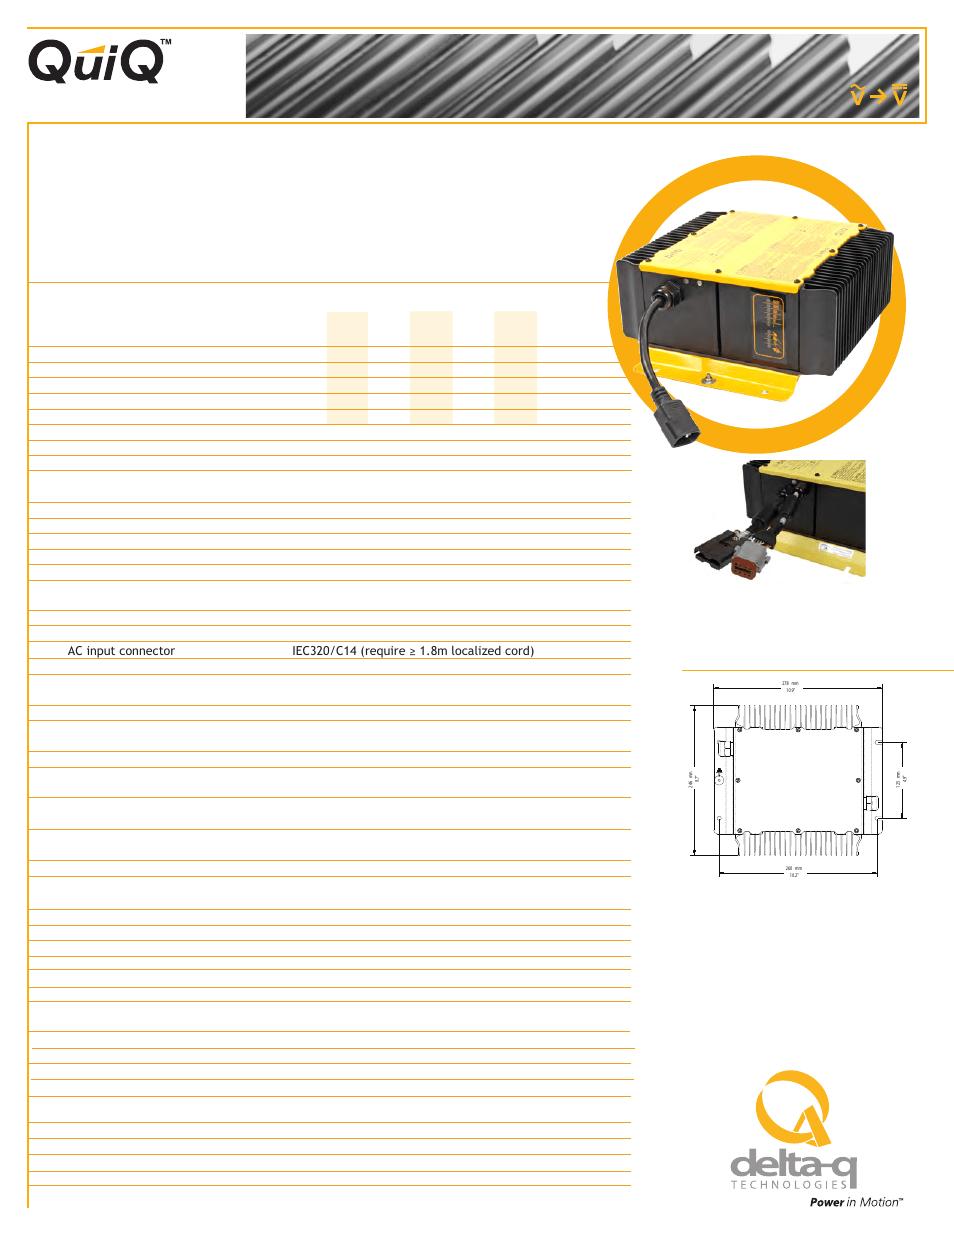 Ac Wiring Diagram Pdf Quiq Datasheet Back 11 10 07 Pdf Electric Vehicle Battery